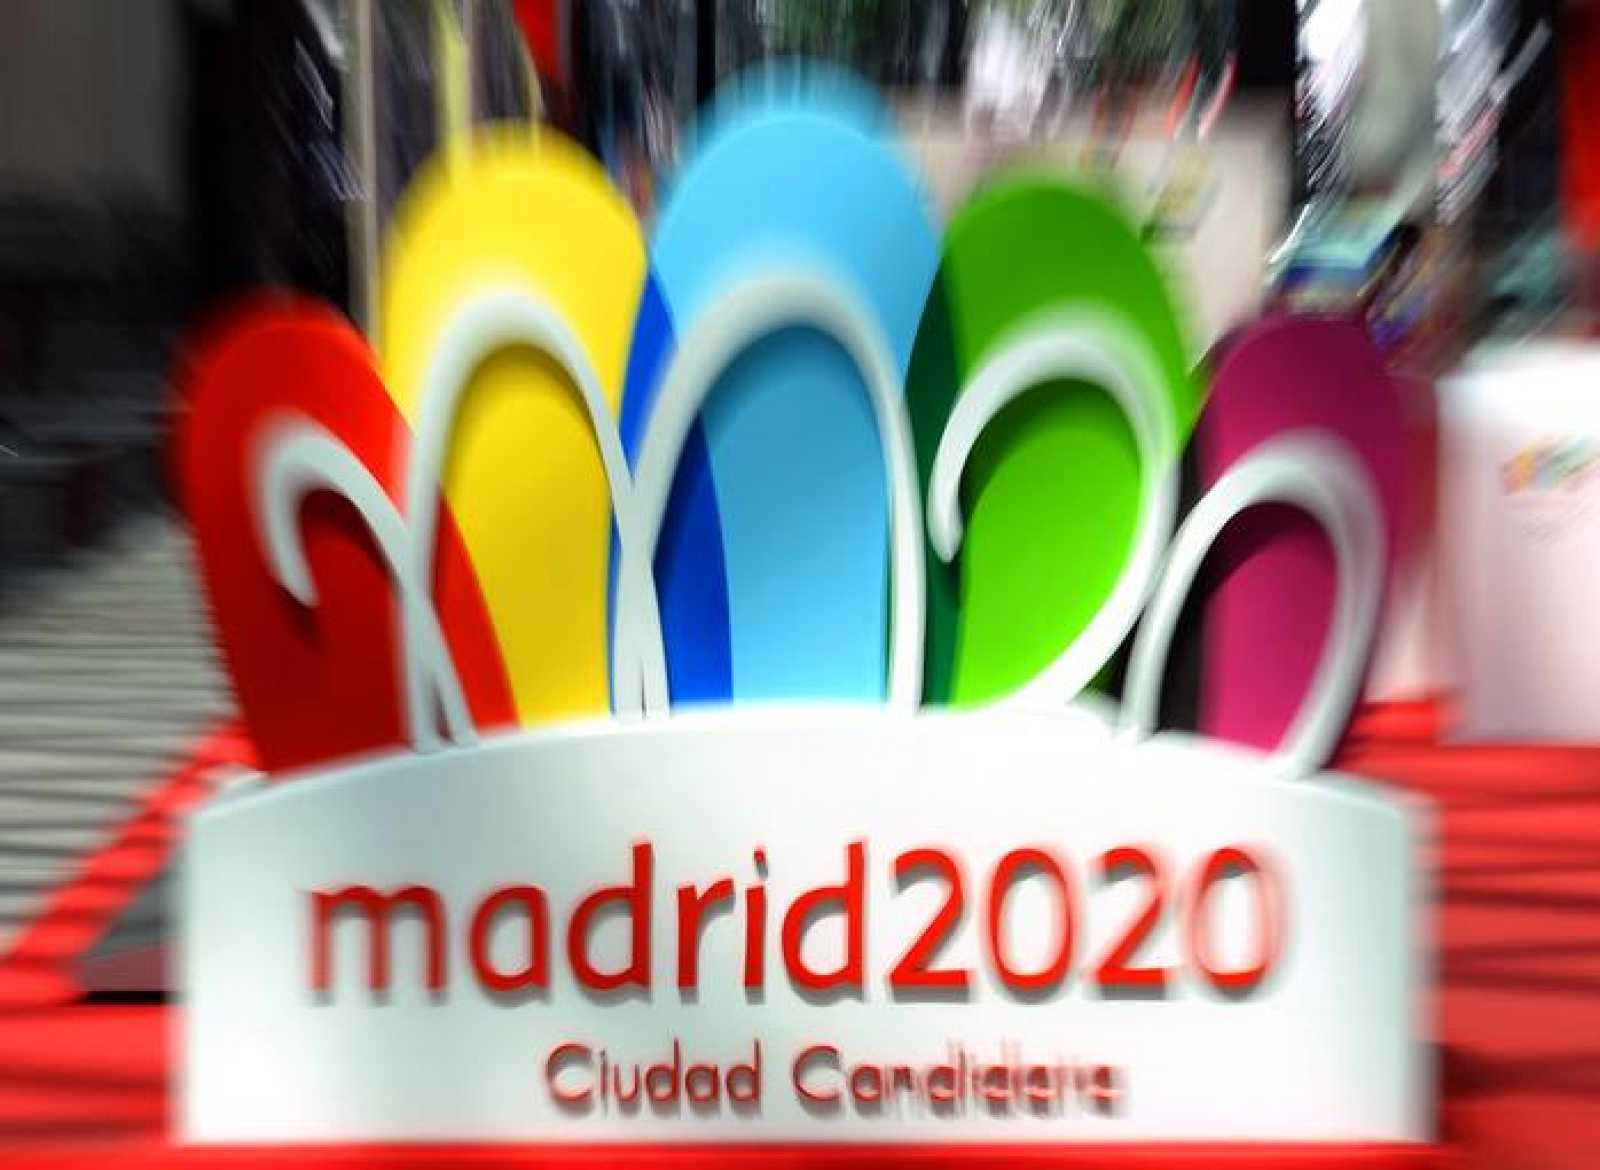 Imagen del logo de la candidatura olímpica de Madrid 2020.